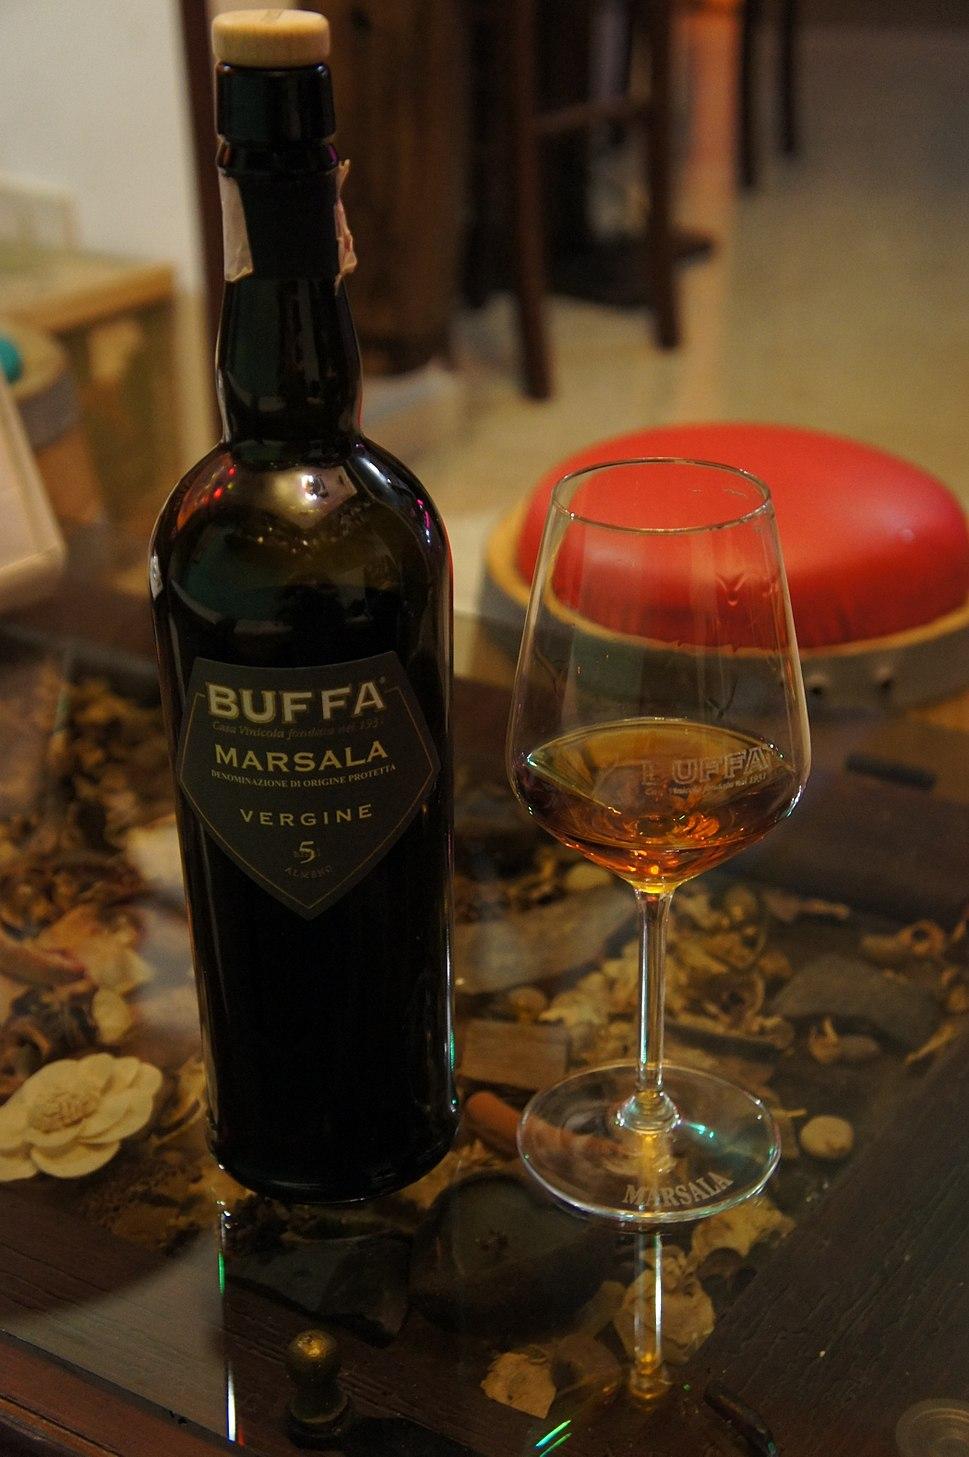 Buffa Vergine Marsala Wine